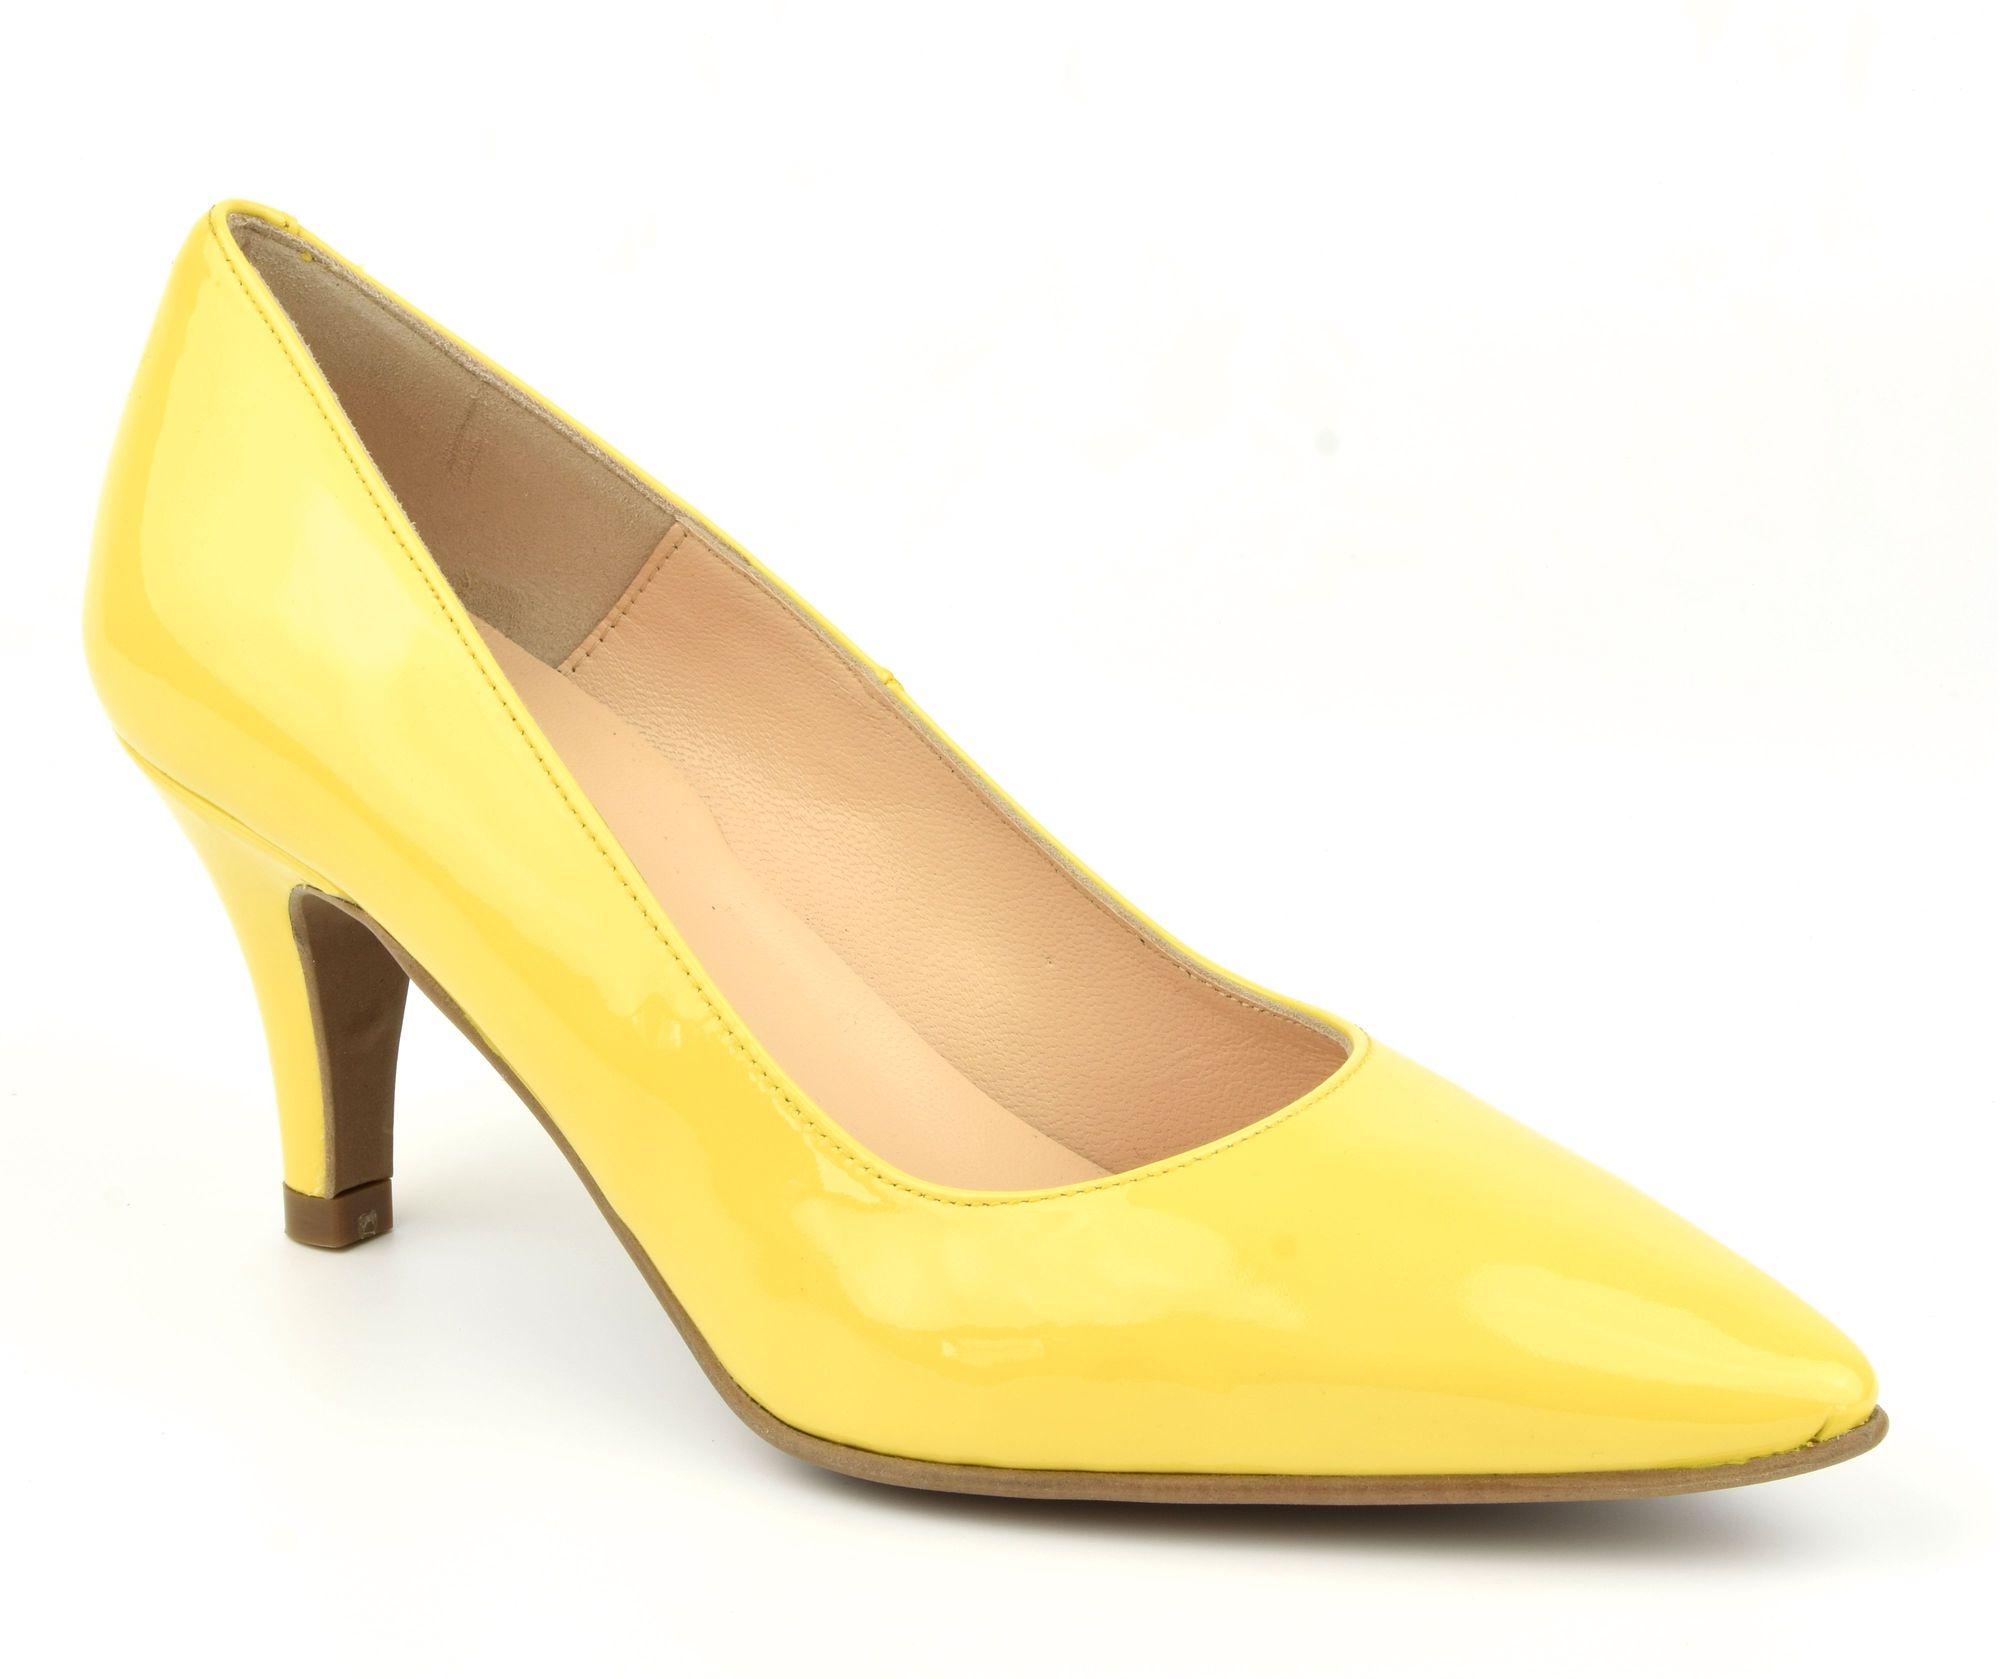 escarpins verni jaune bout pointus petite pointure